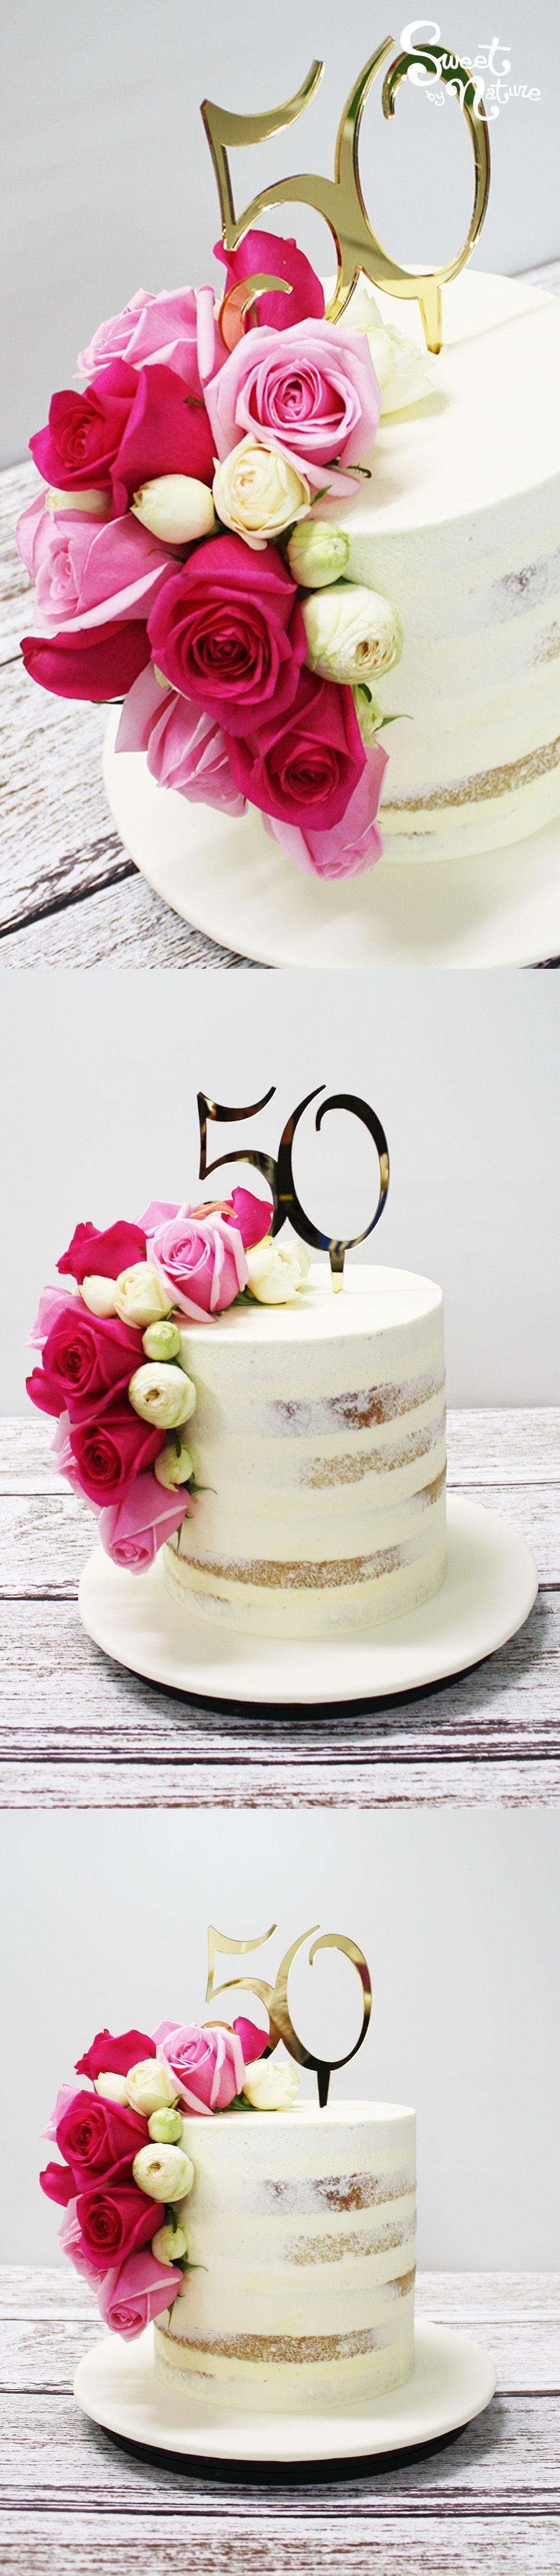 A perfect milestone birthday cake: Semi naked 50th birthday cake ...